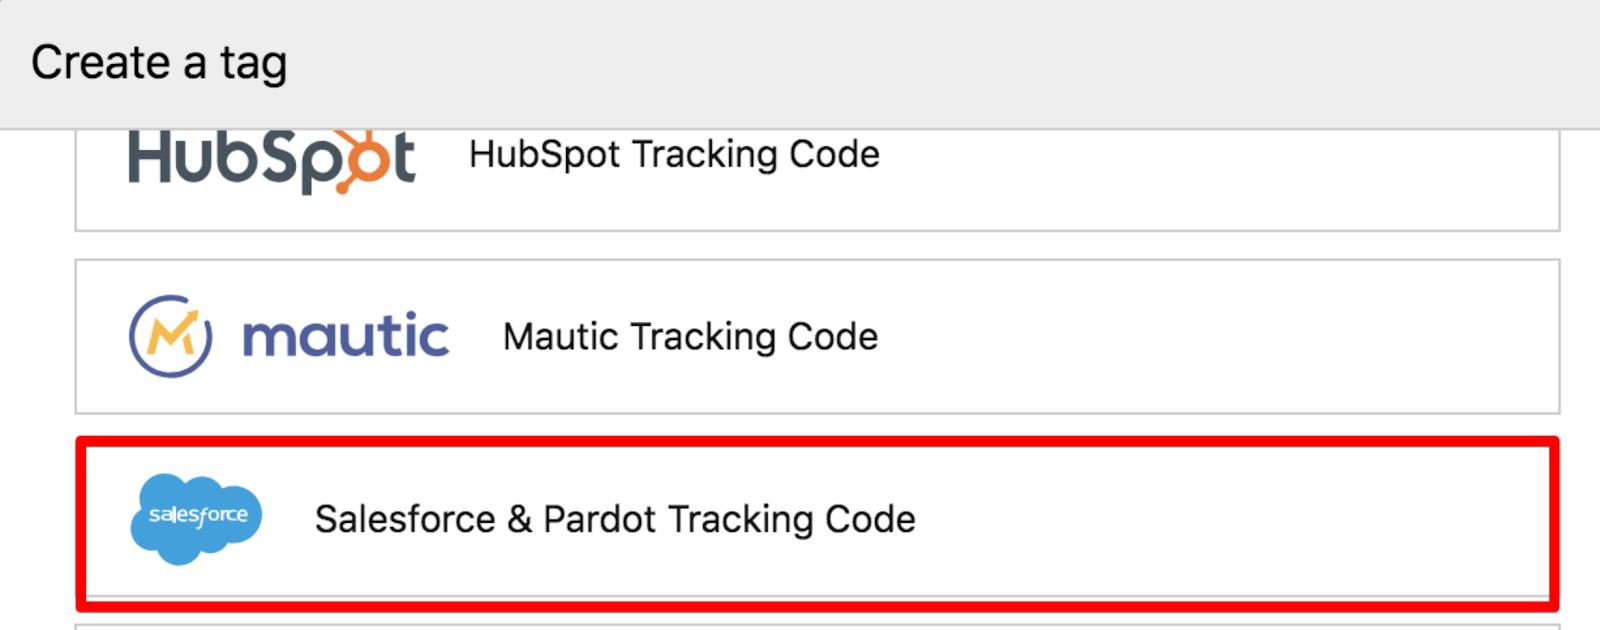 Salesforce Pardot Tracking Code Piwik Pro Help